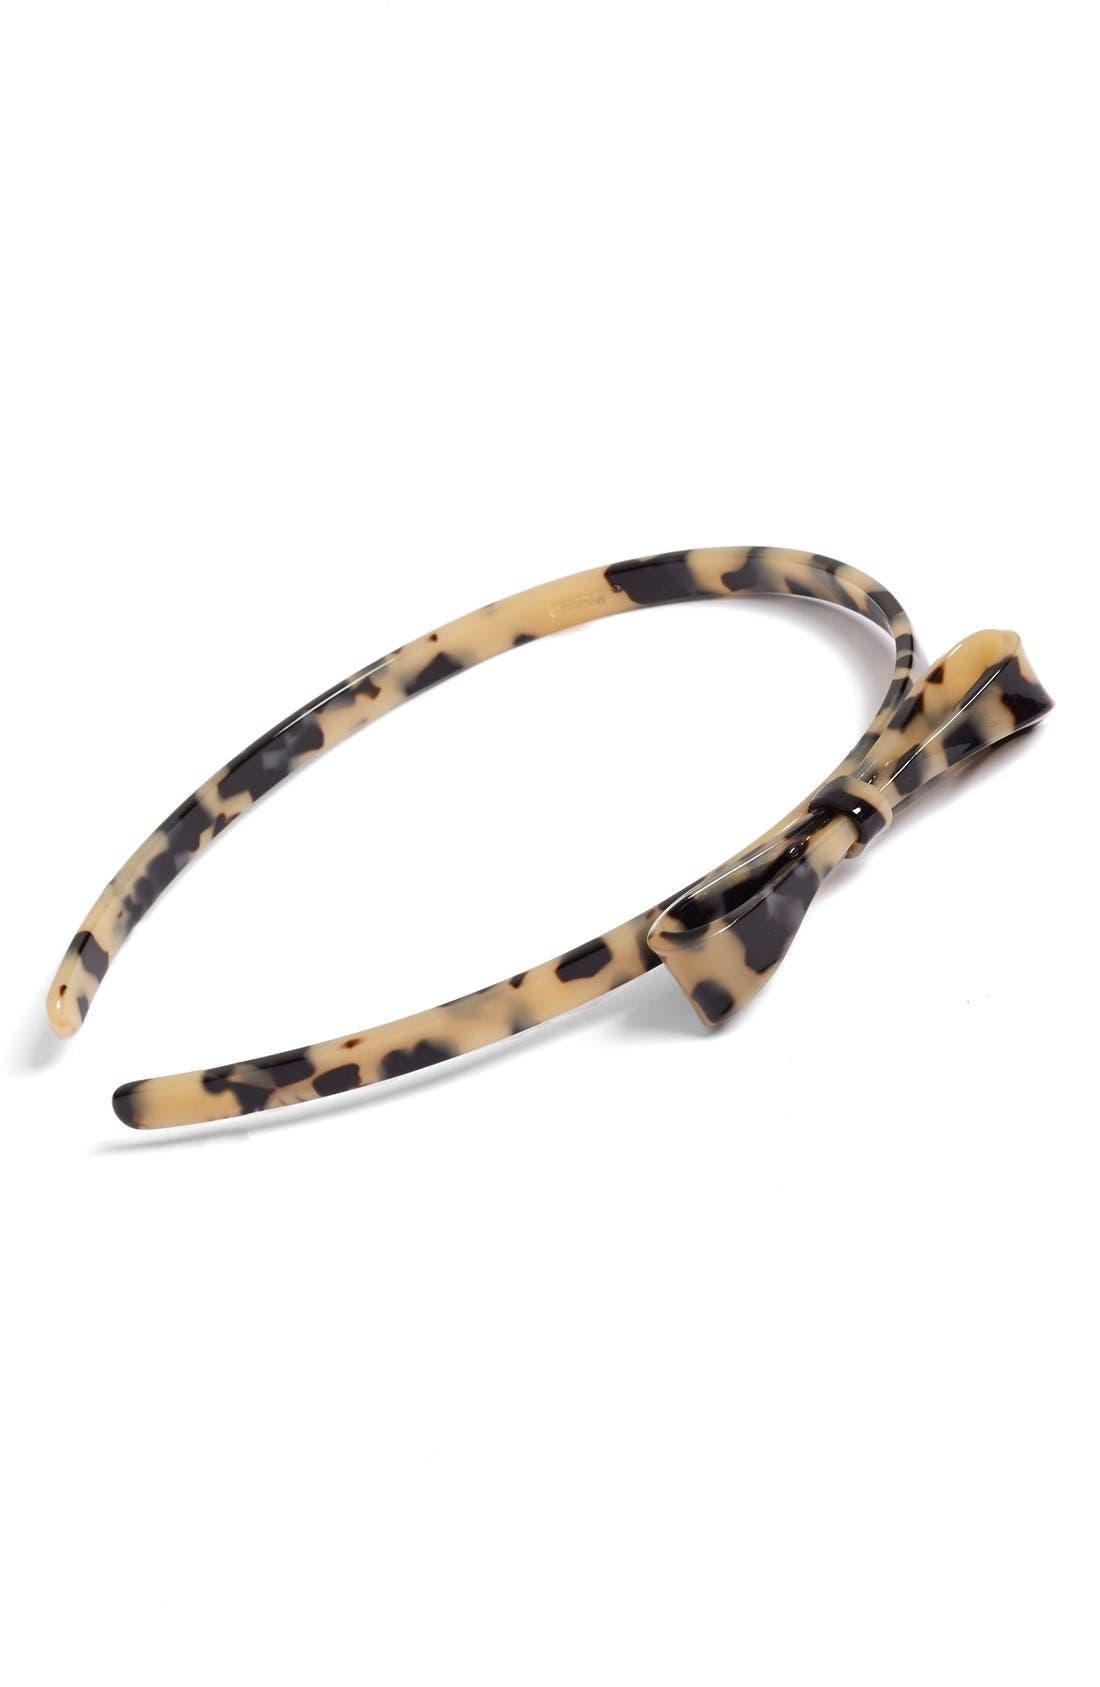 Alternate Image 1 Selected - L. Erickson 'Swanky Bow' Headband